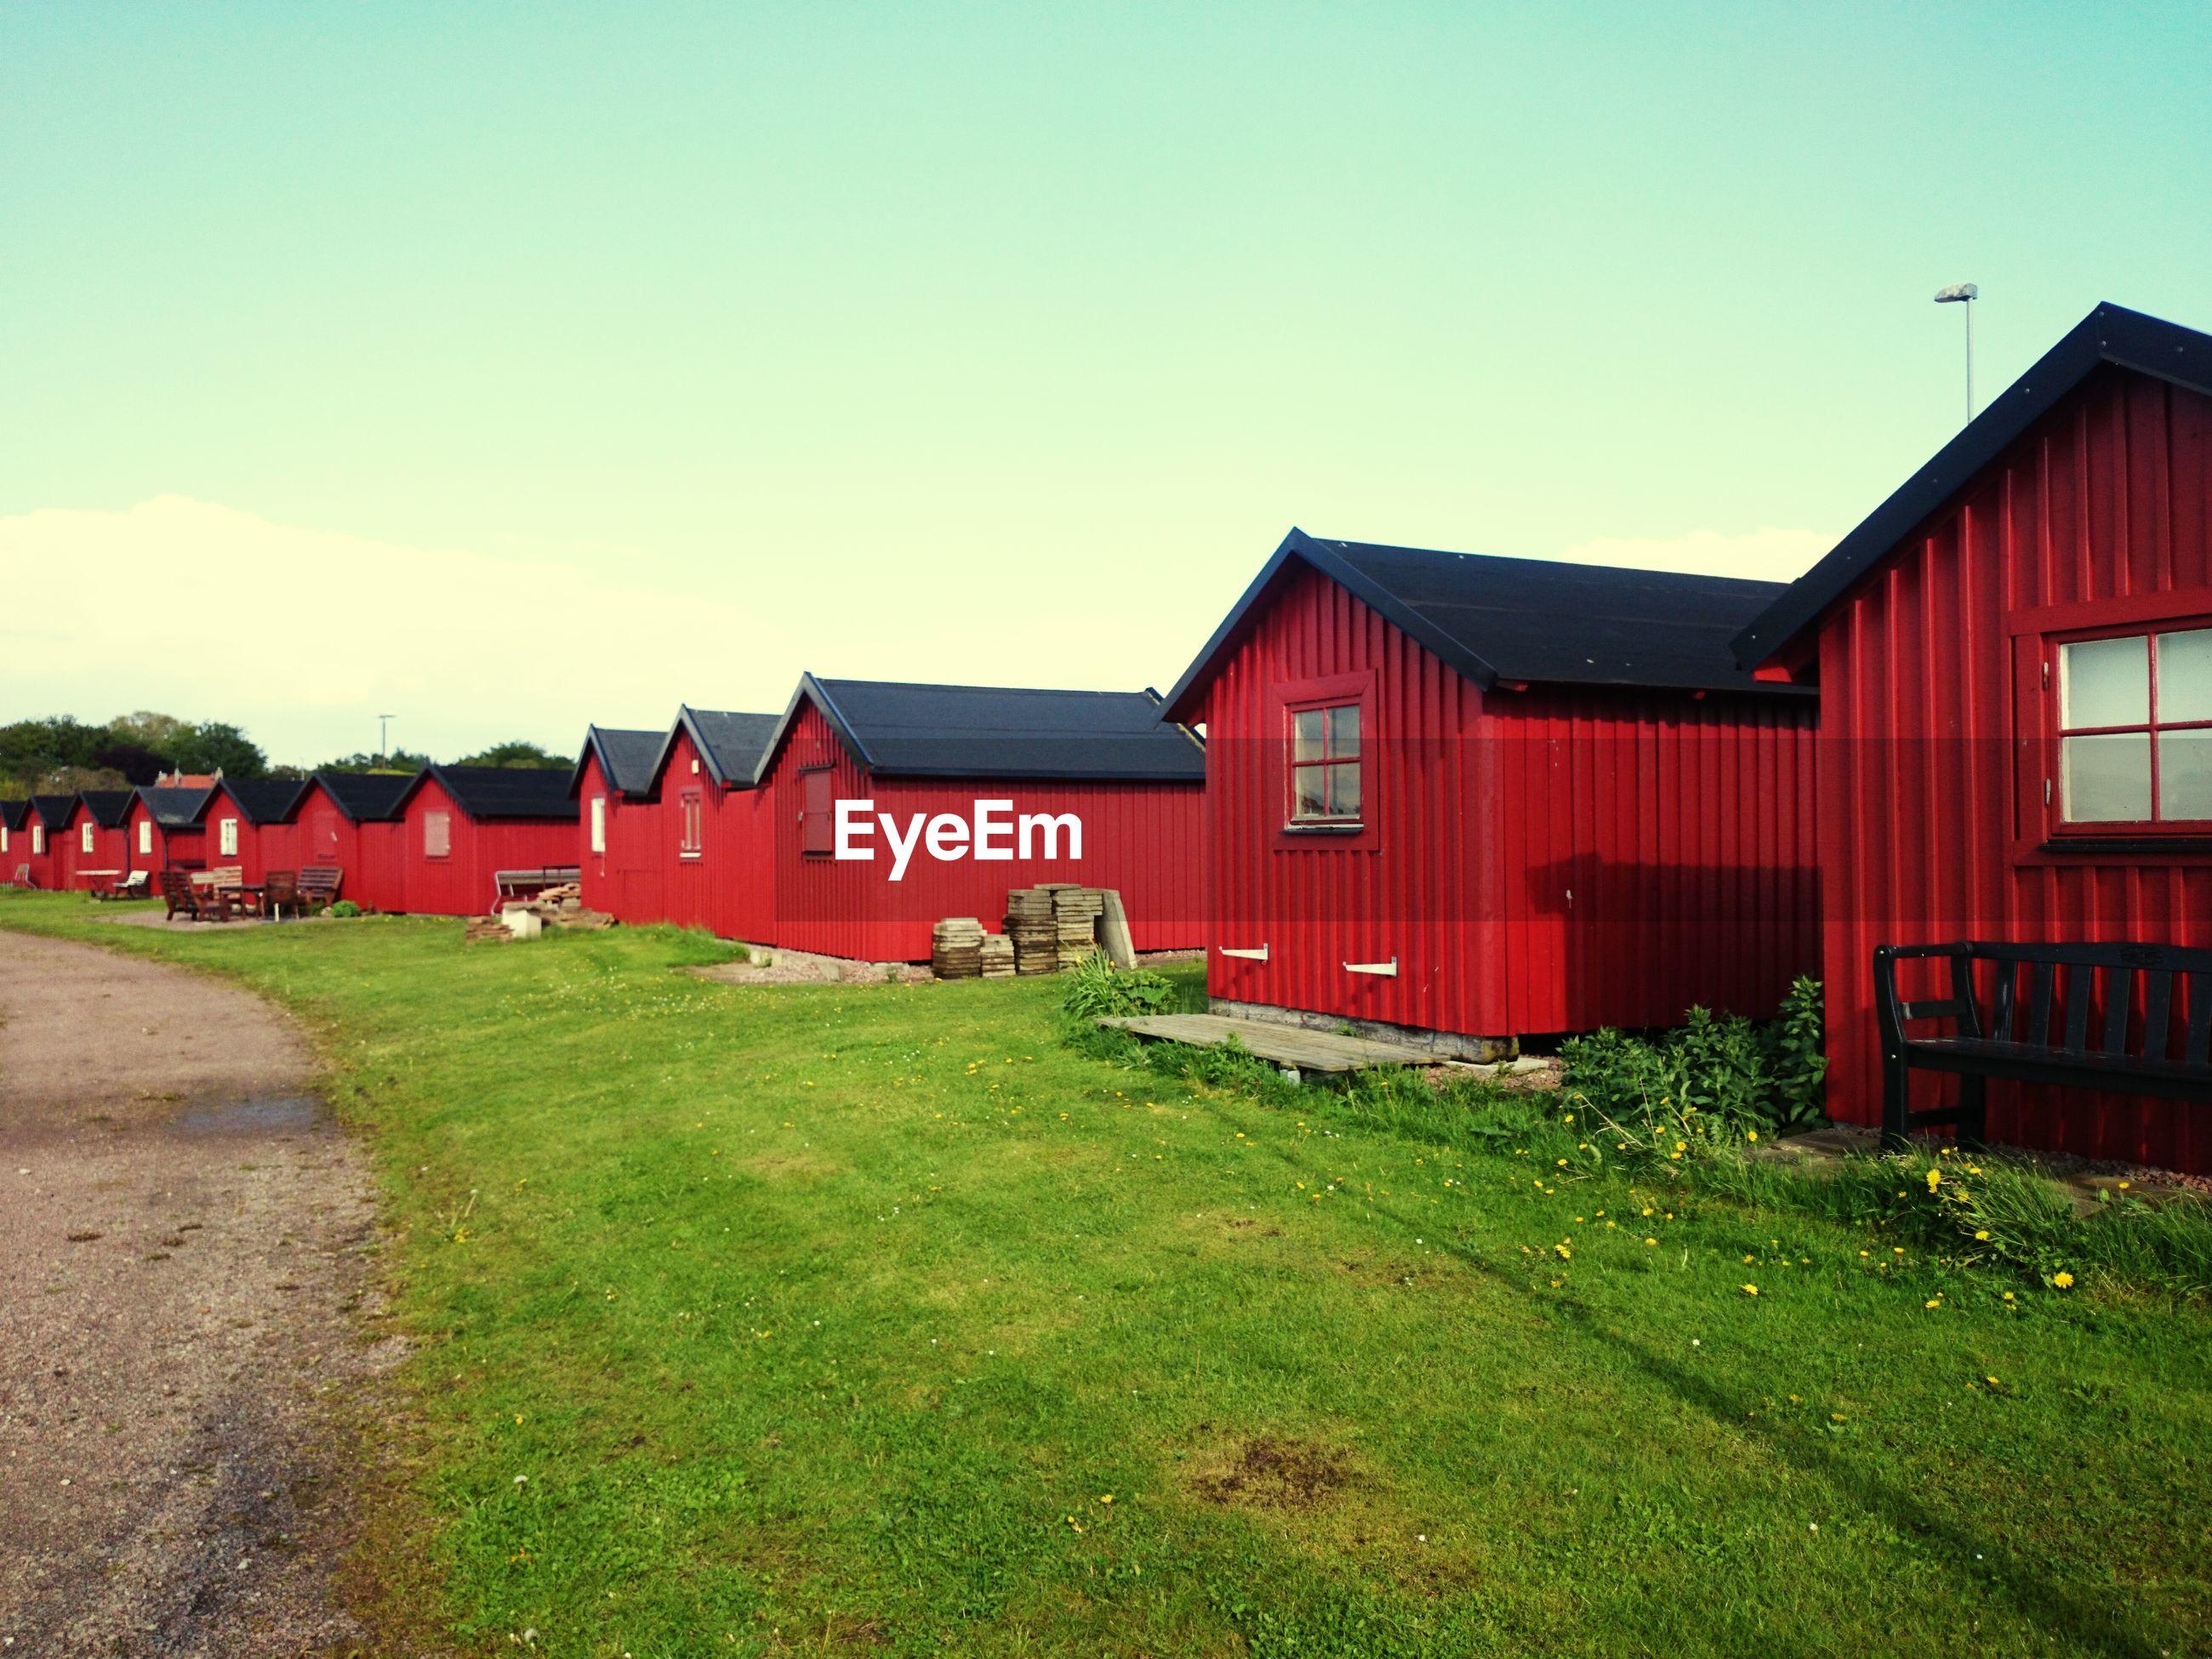 HOUSES ON GRASSY FIELD AGAINST SKY